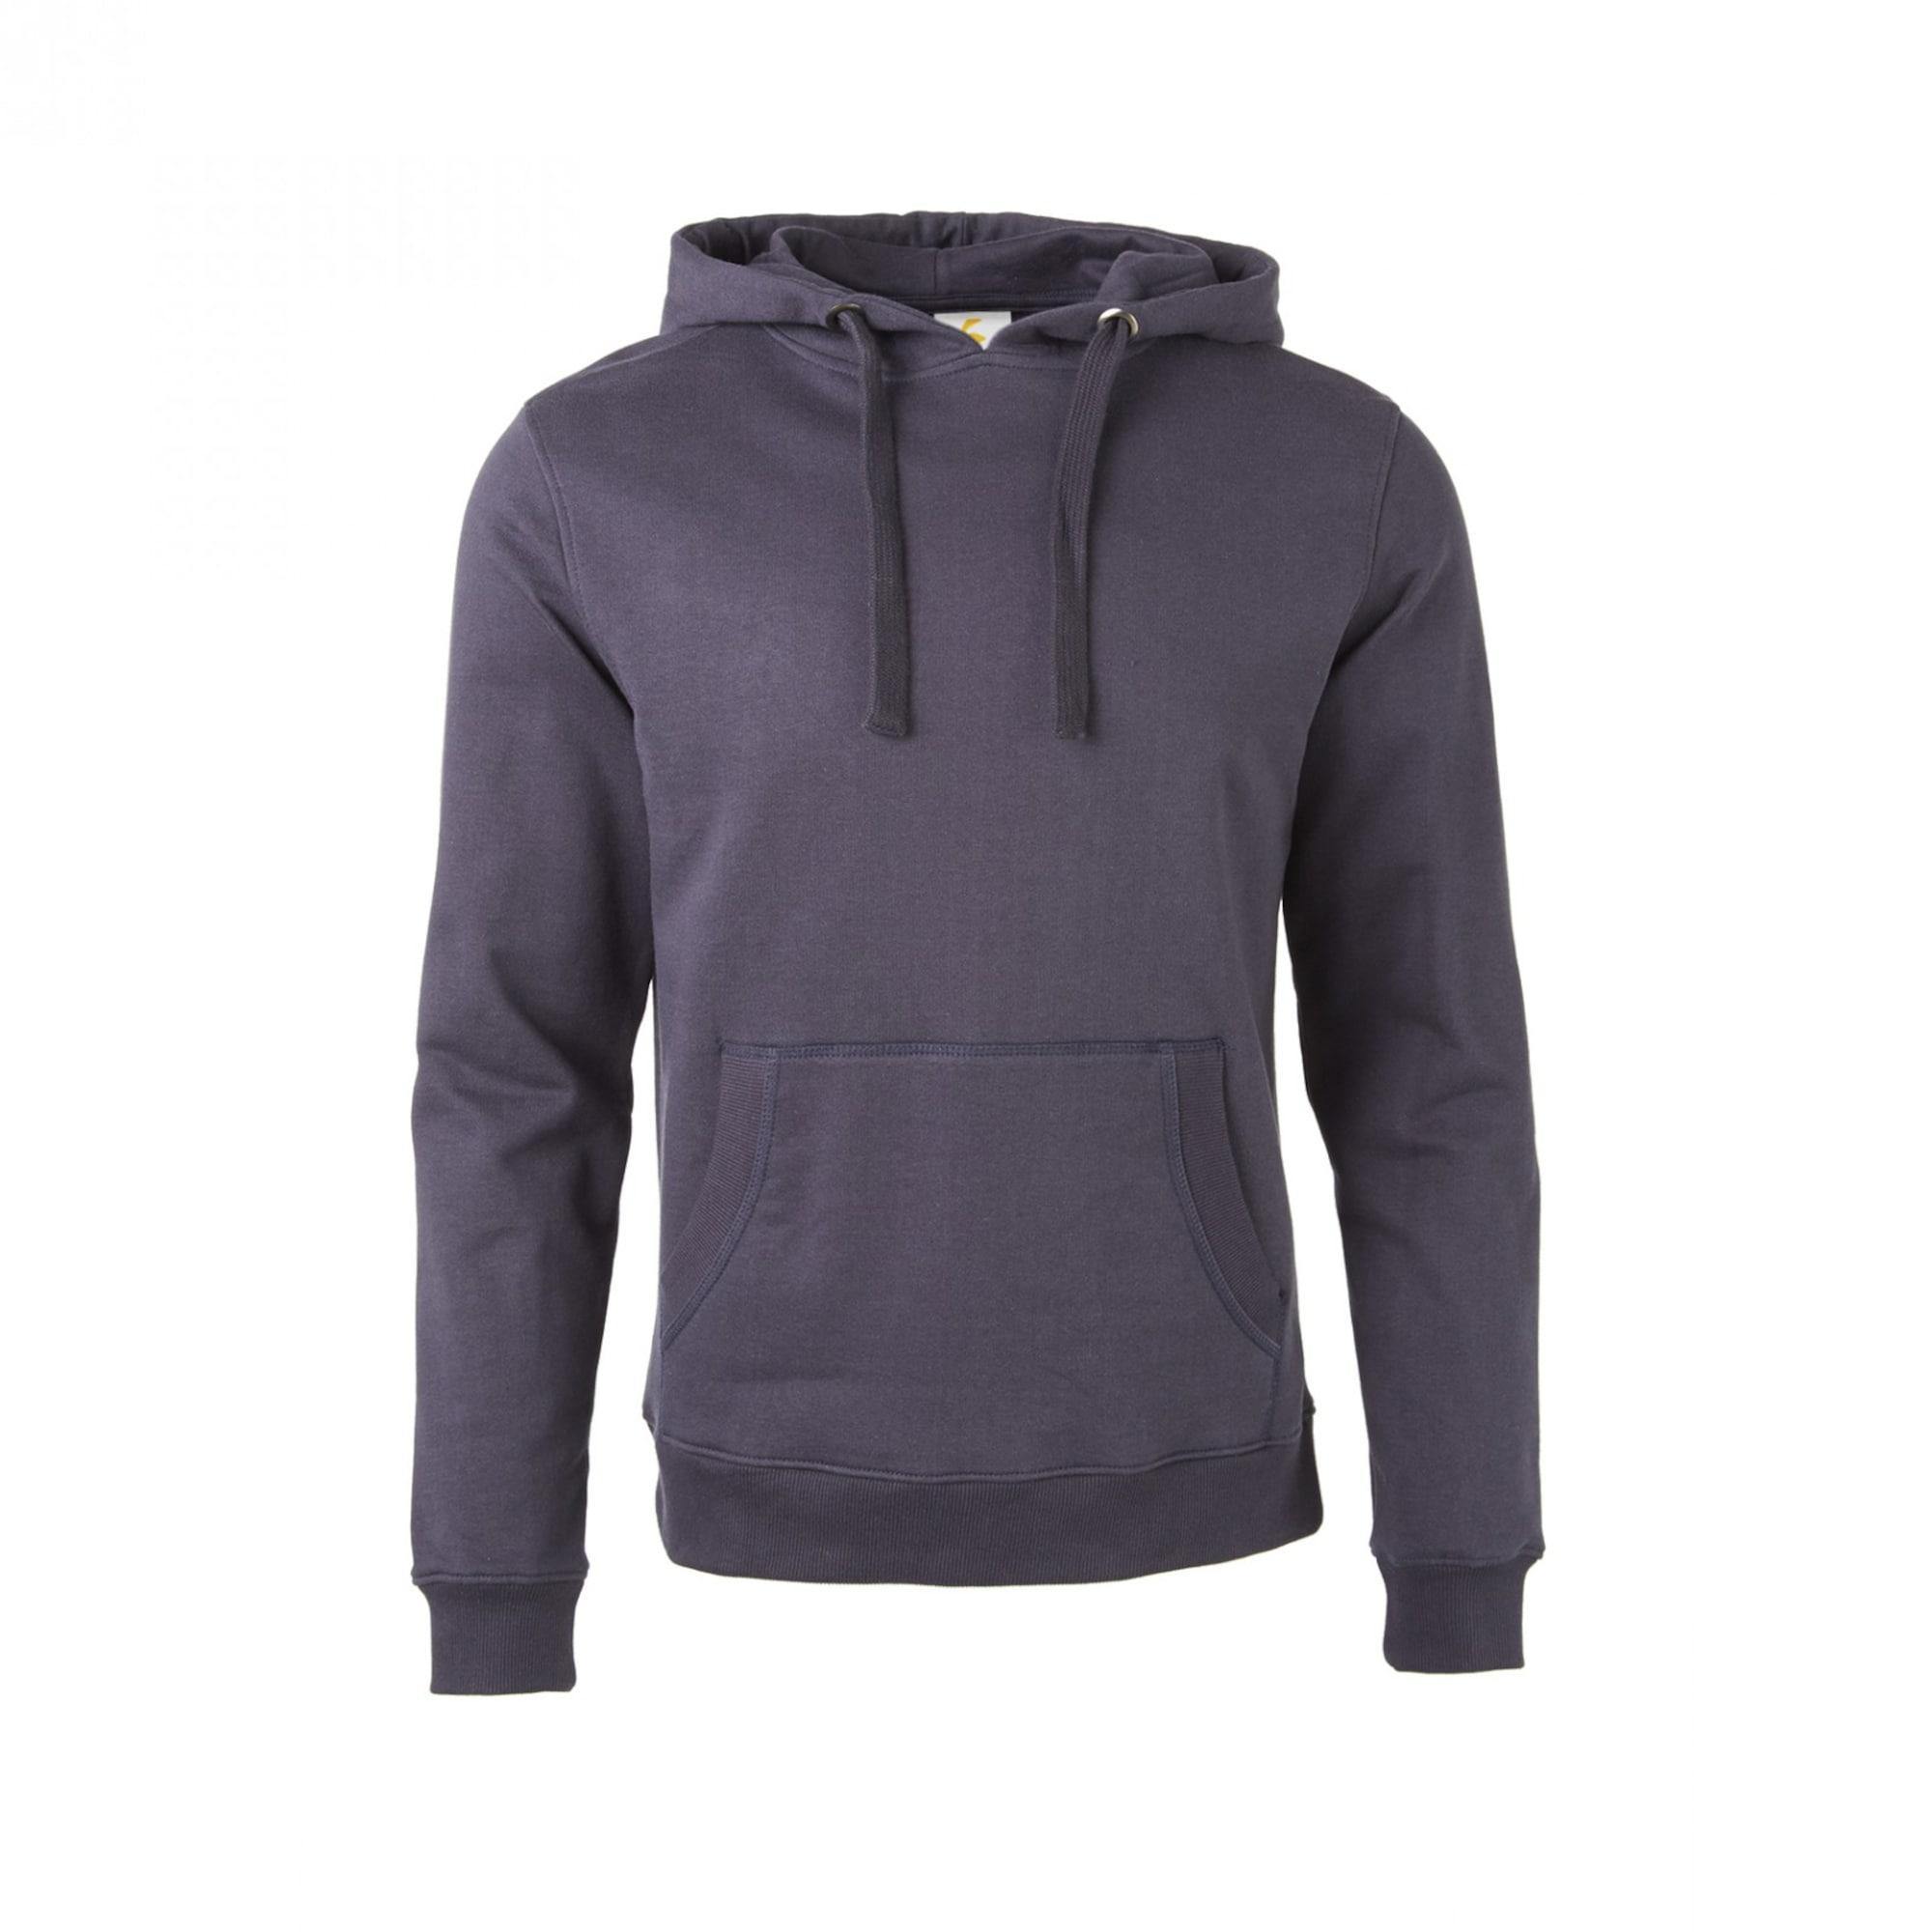 Sweatshirt 'NIELS GOTS' | Bekleidung > Sweatshirts & -jacken > Sweatshirts | BRDS